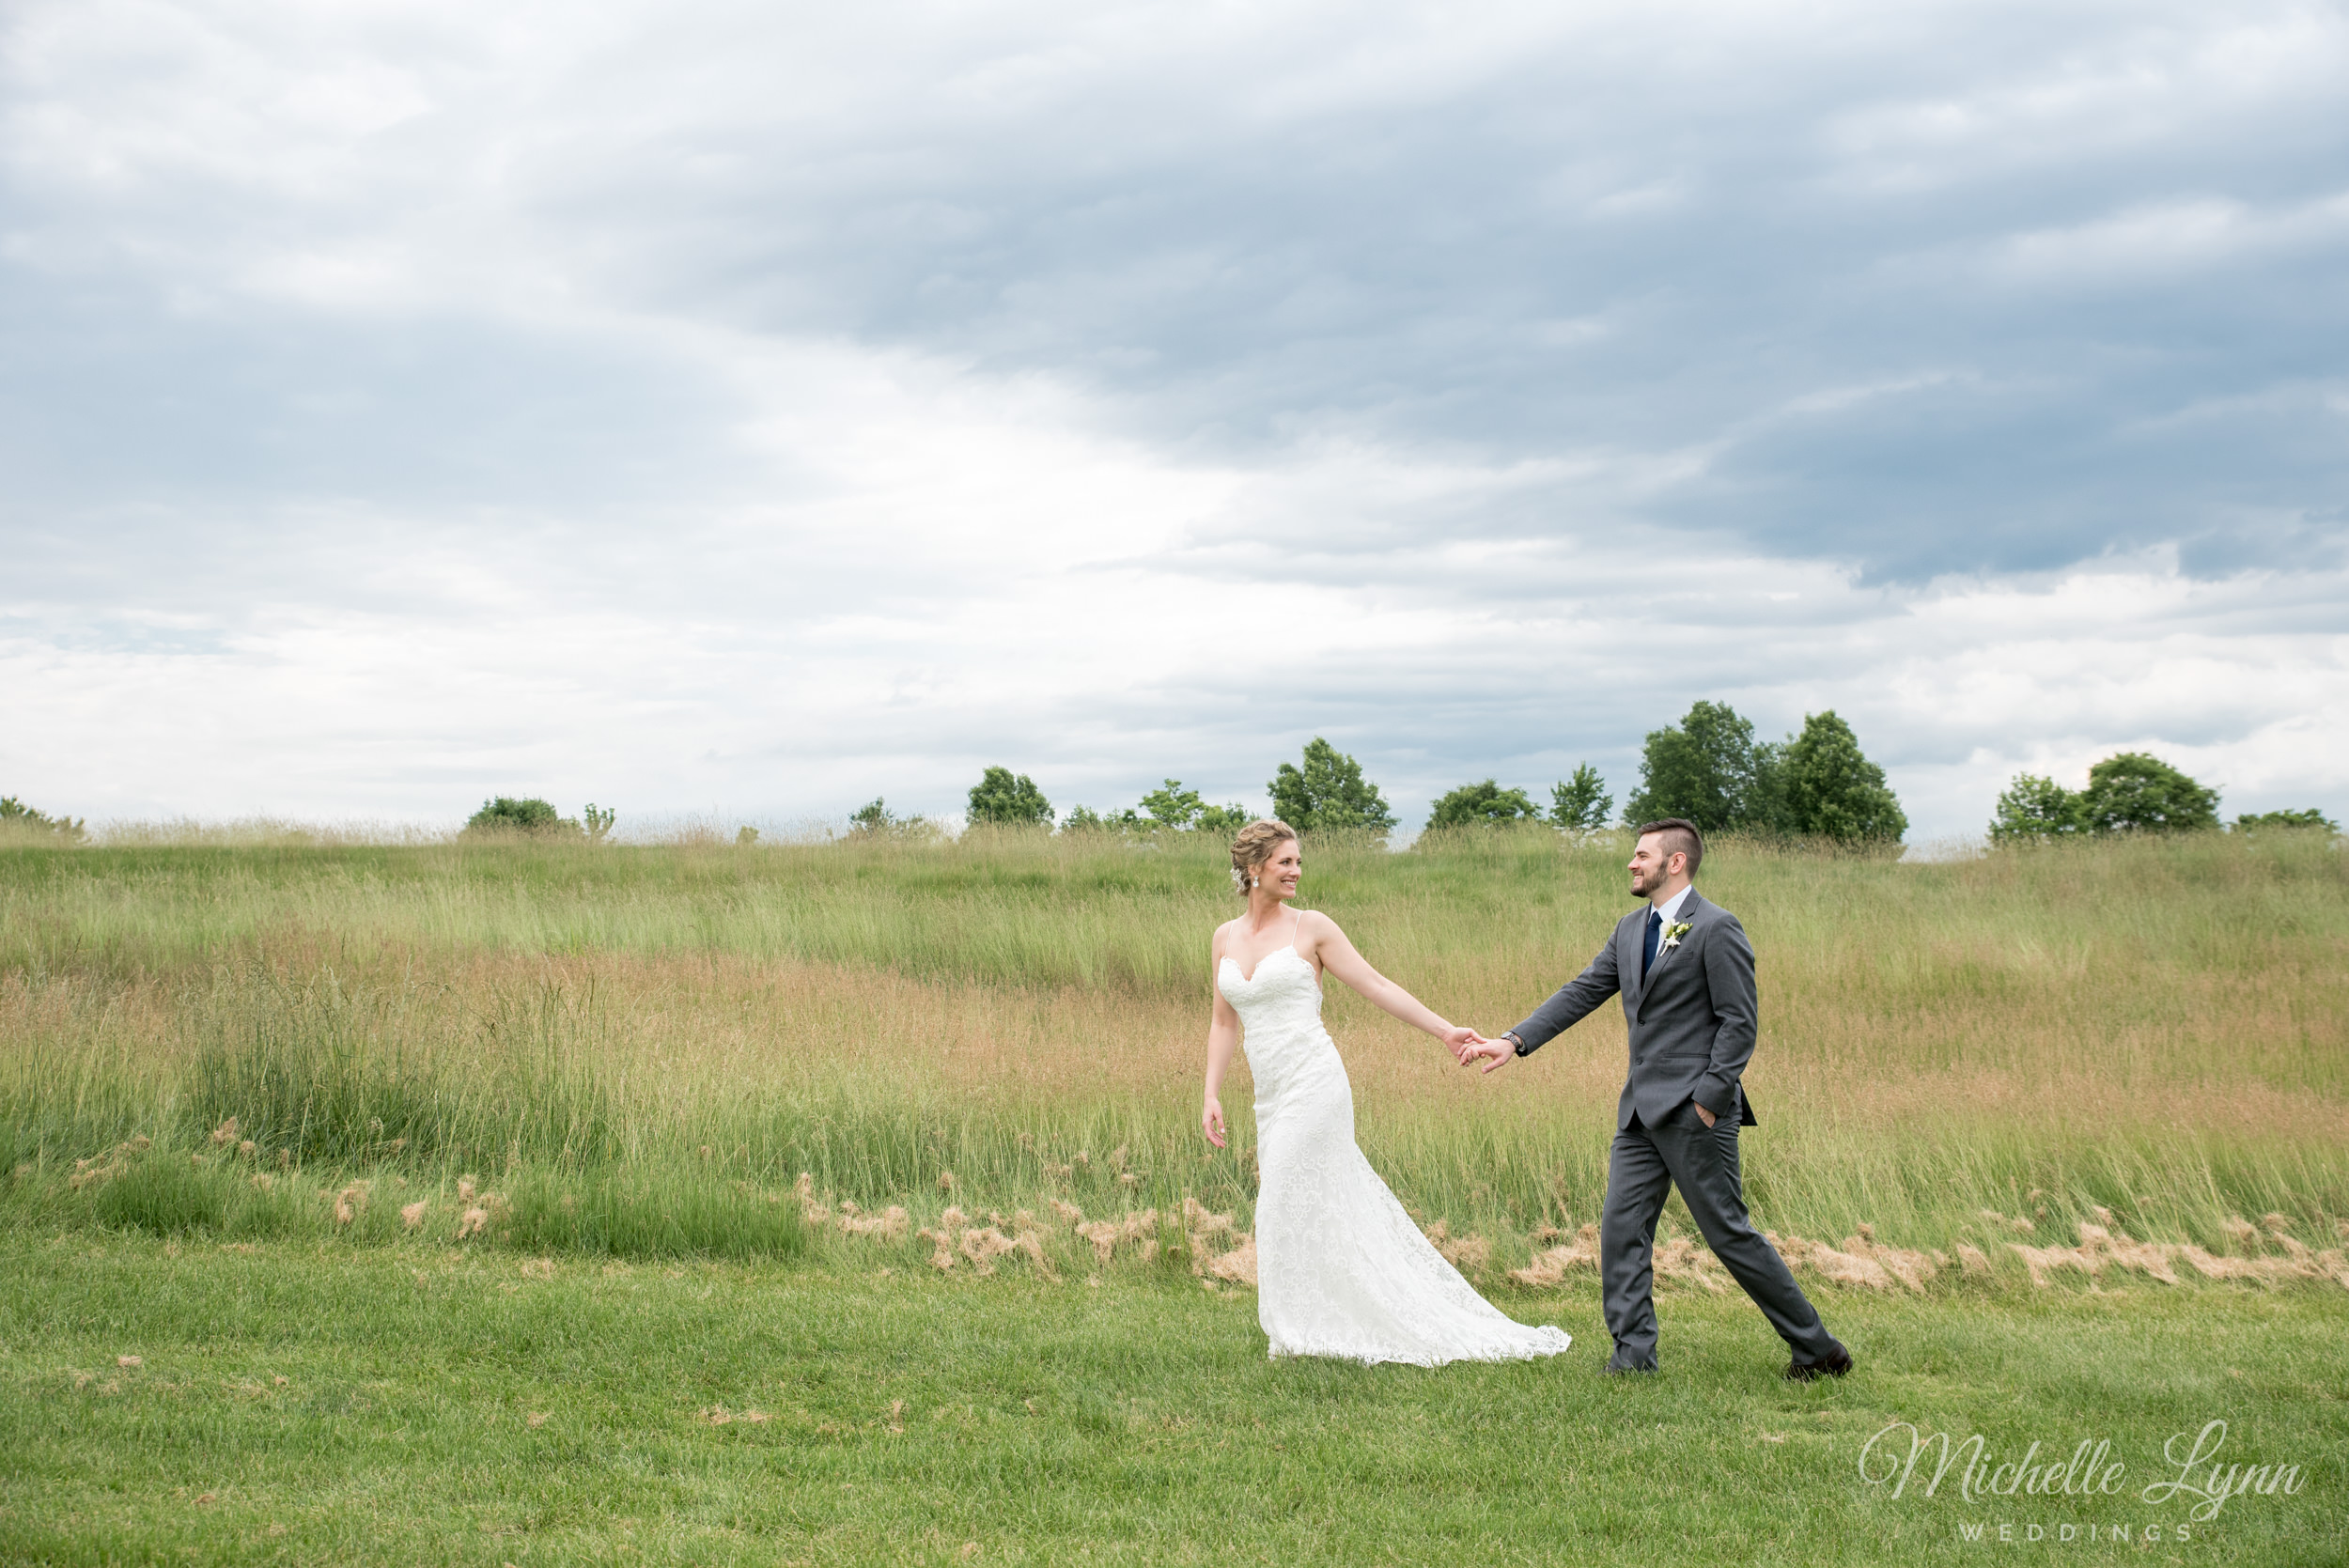 mlw-jericho-national-golf-club-wedding-photography-41.jpg